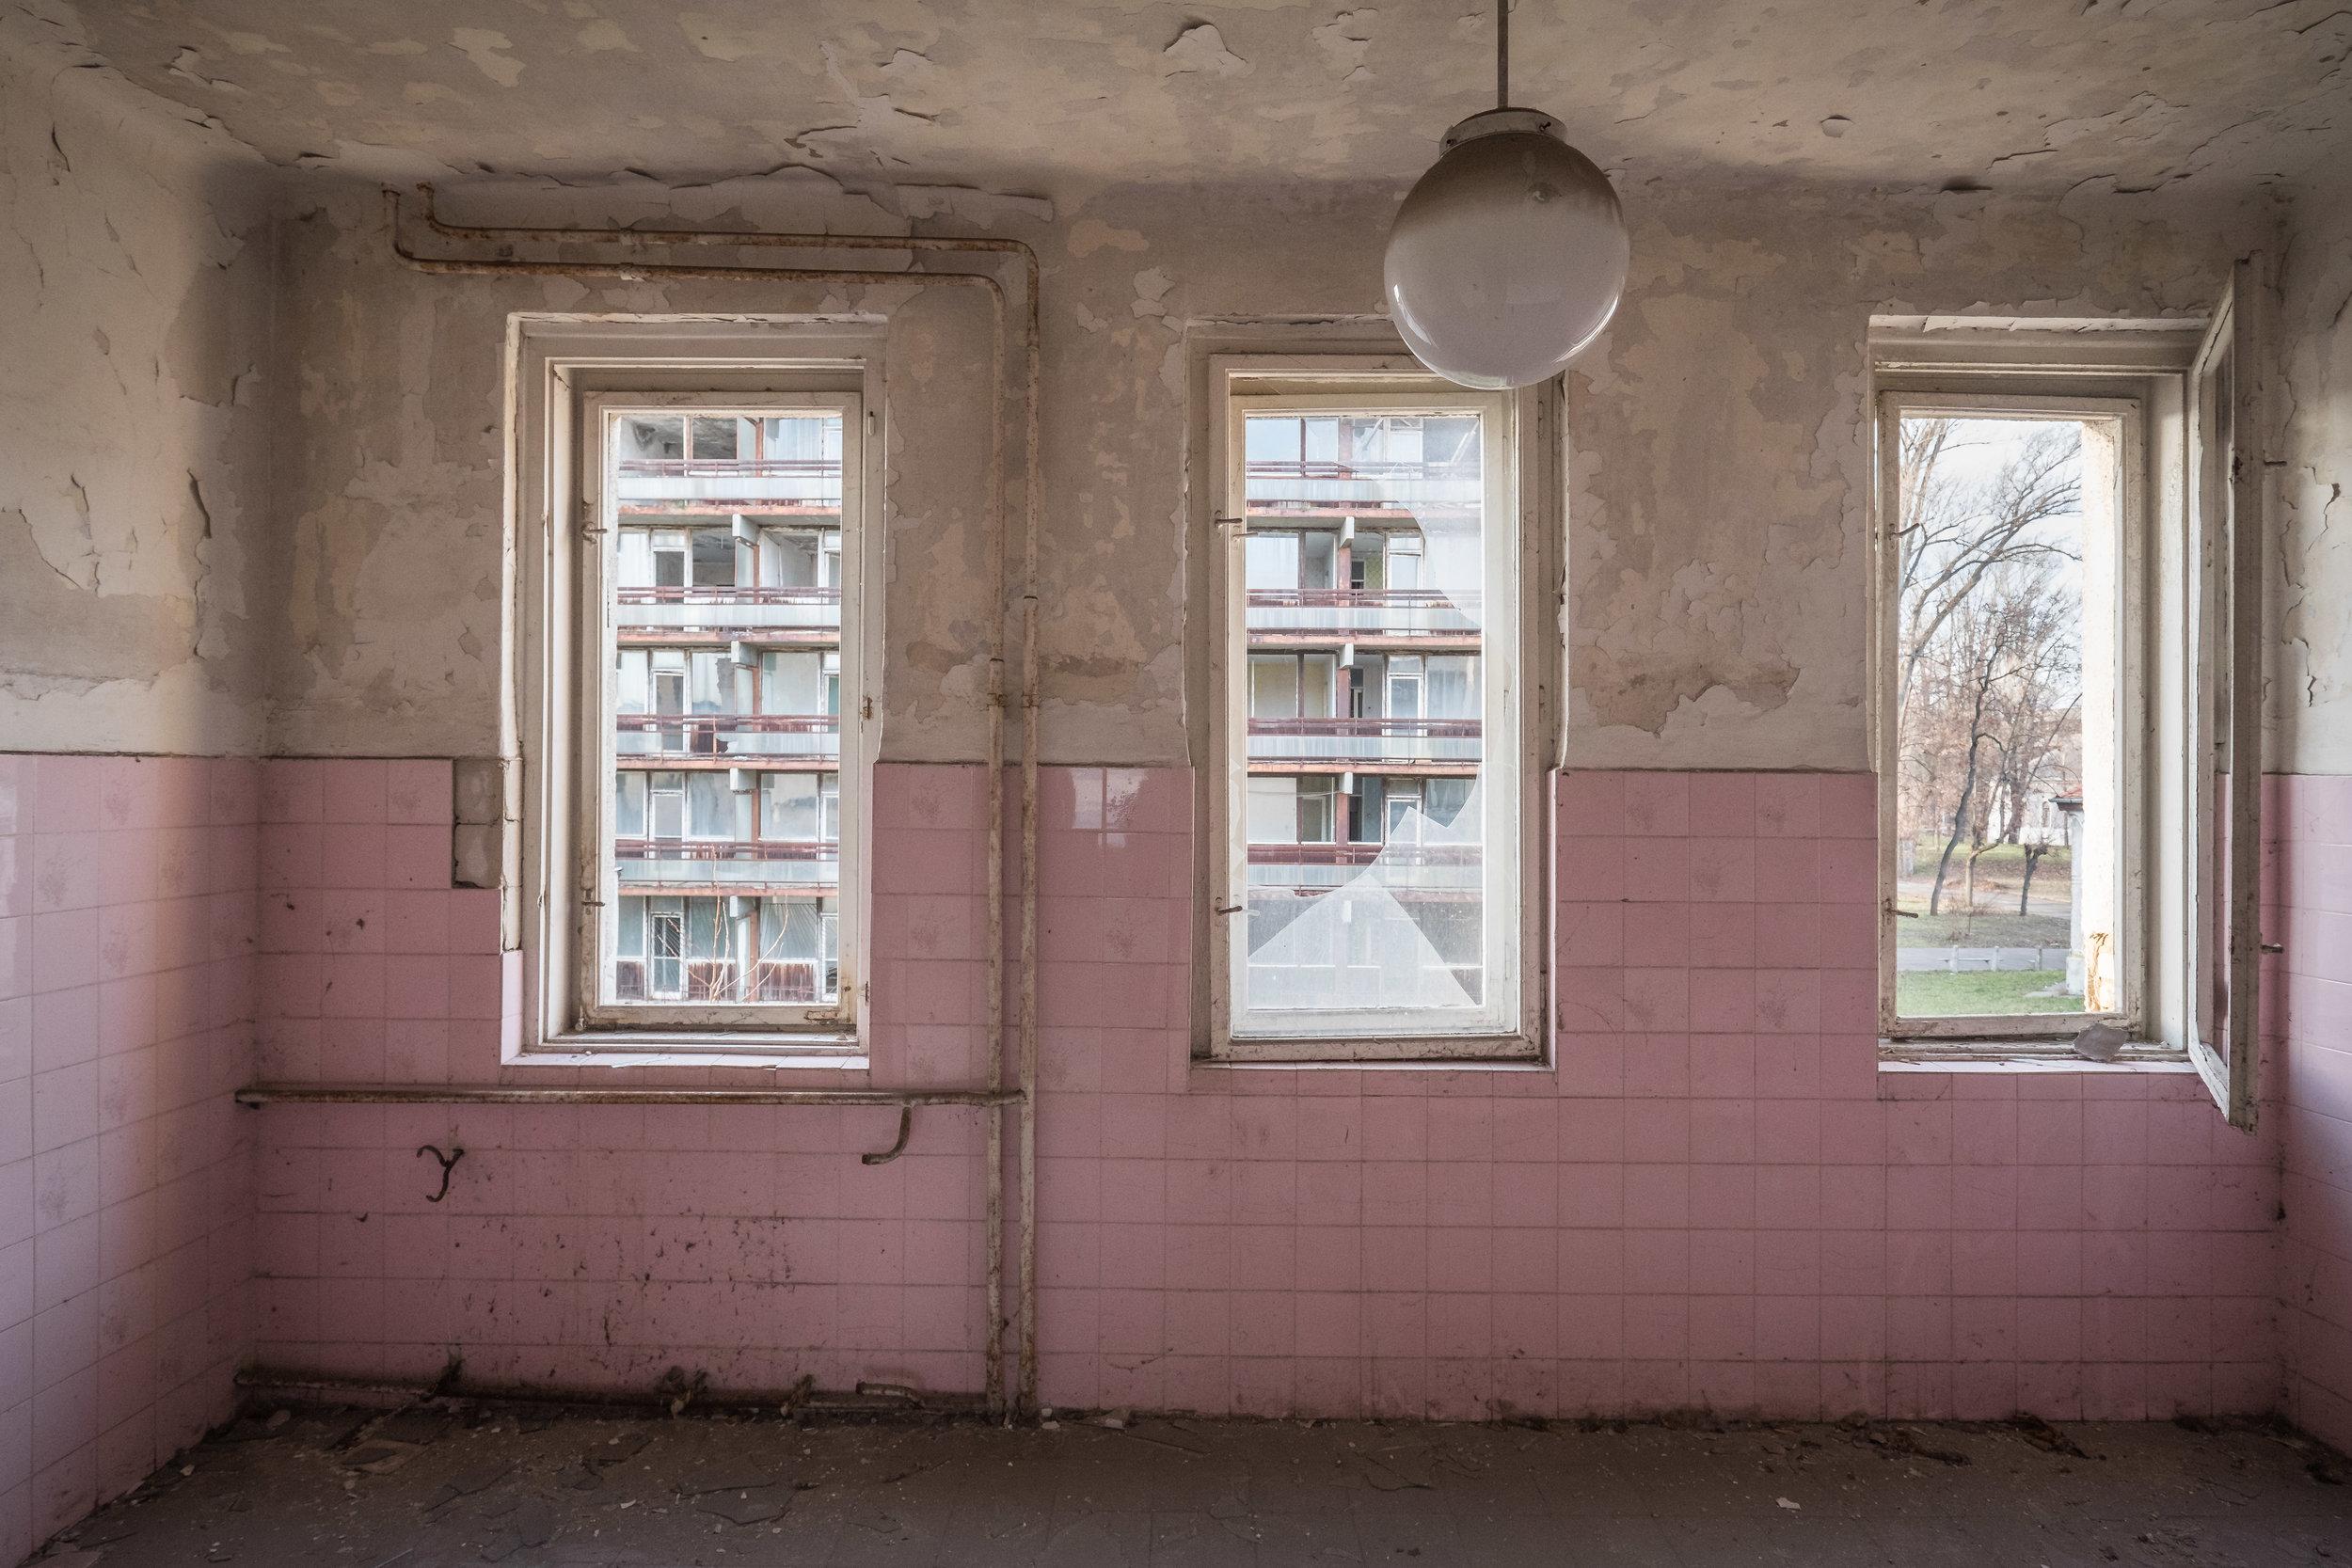 budapest hospital_2-8.jpg